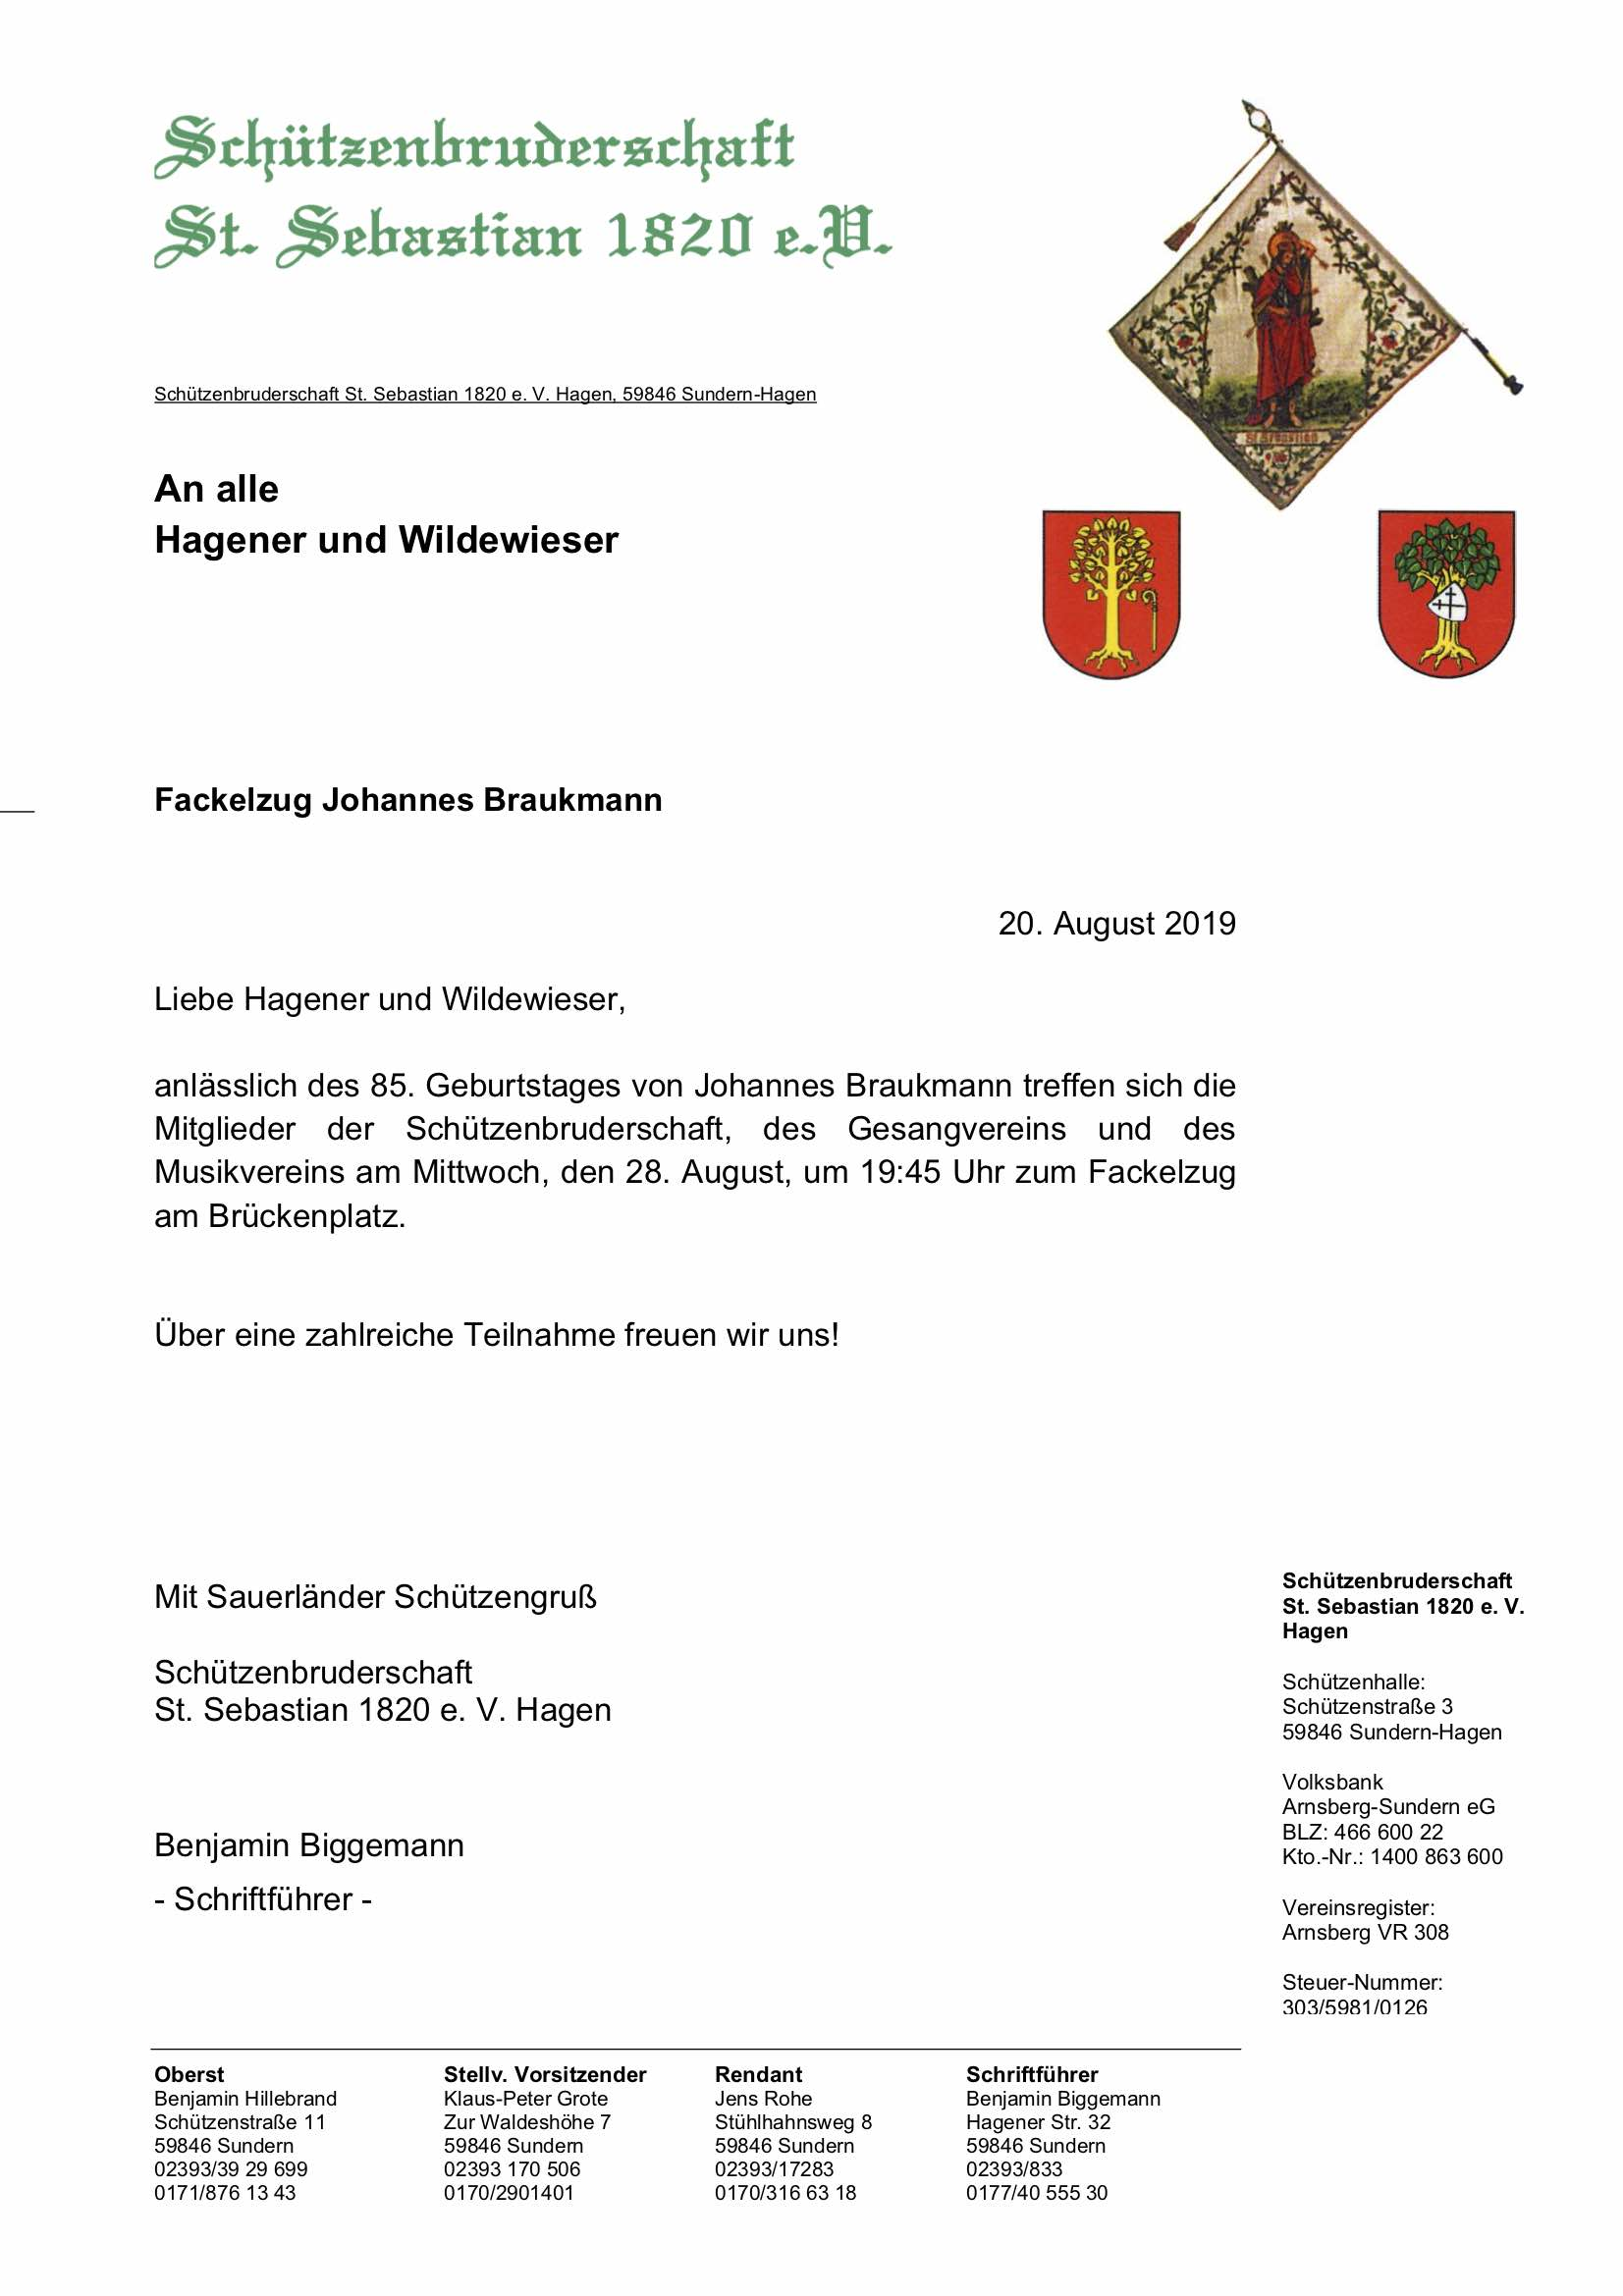 Fackelzug 85.Geburtstag Johannes Braukmann